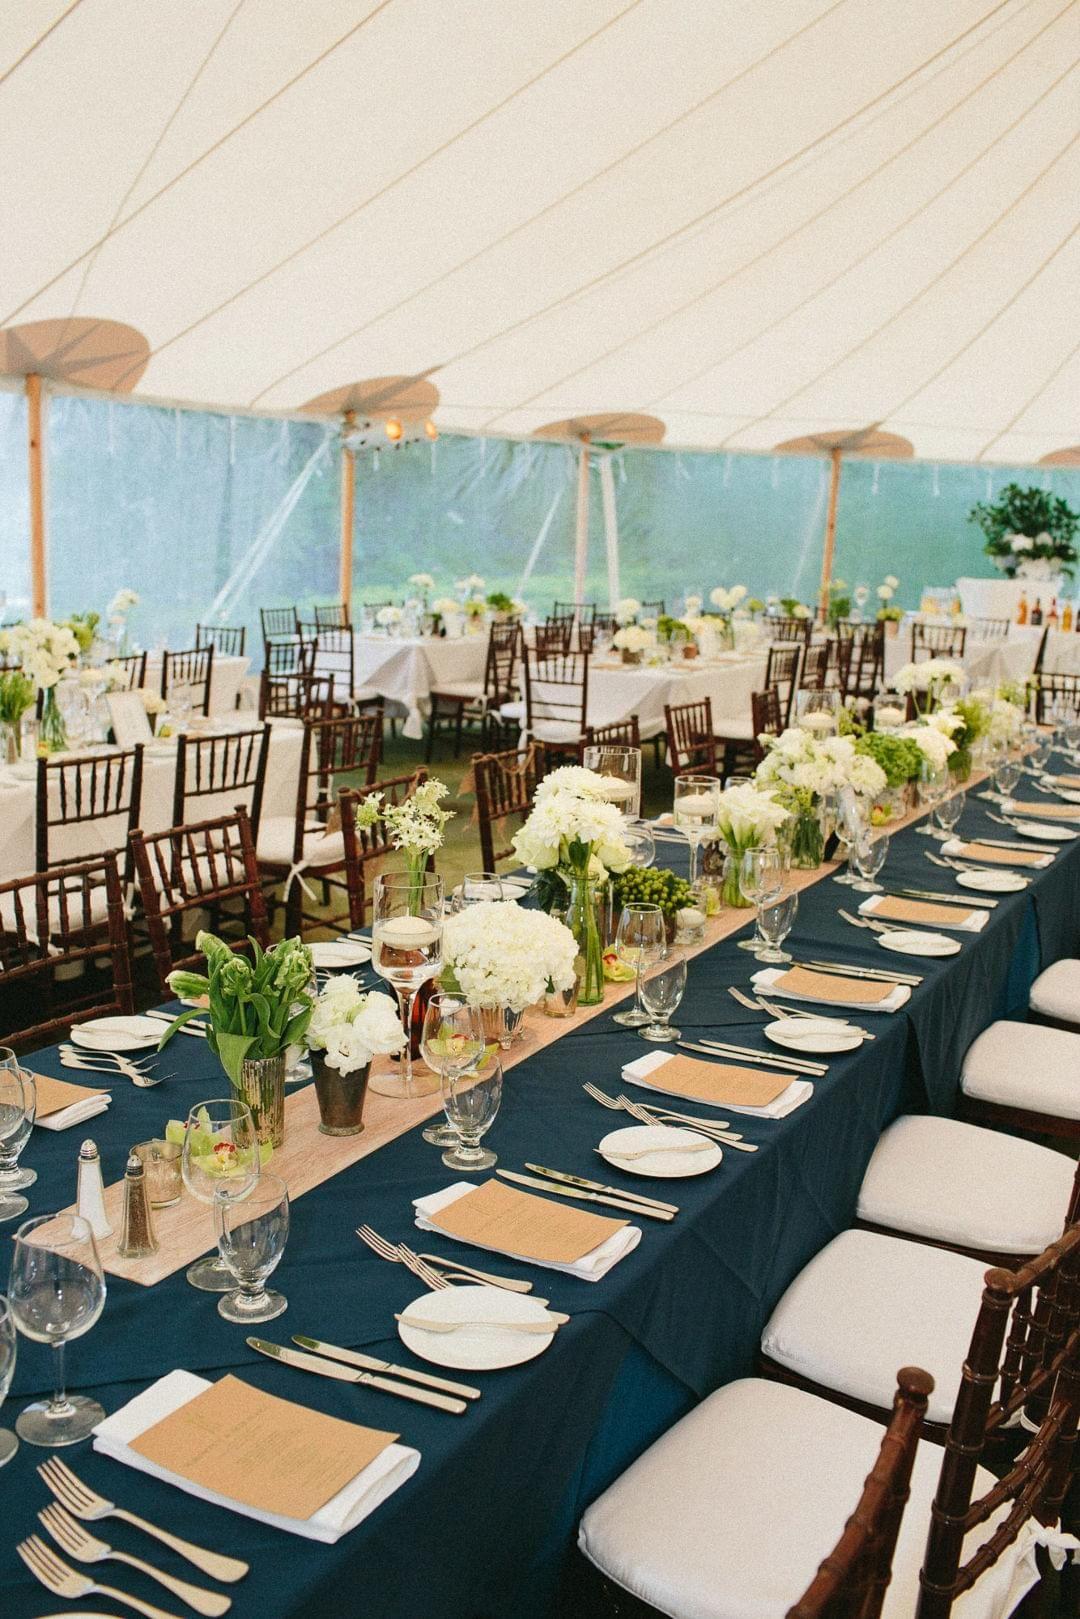 Yacht wedding decoration ideas  The Smarter Way to Wed  Wedding ideas  Pinterest  Hamptons